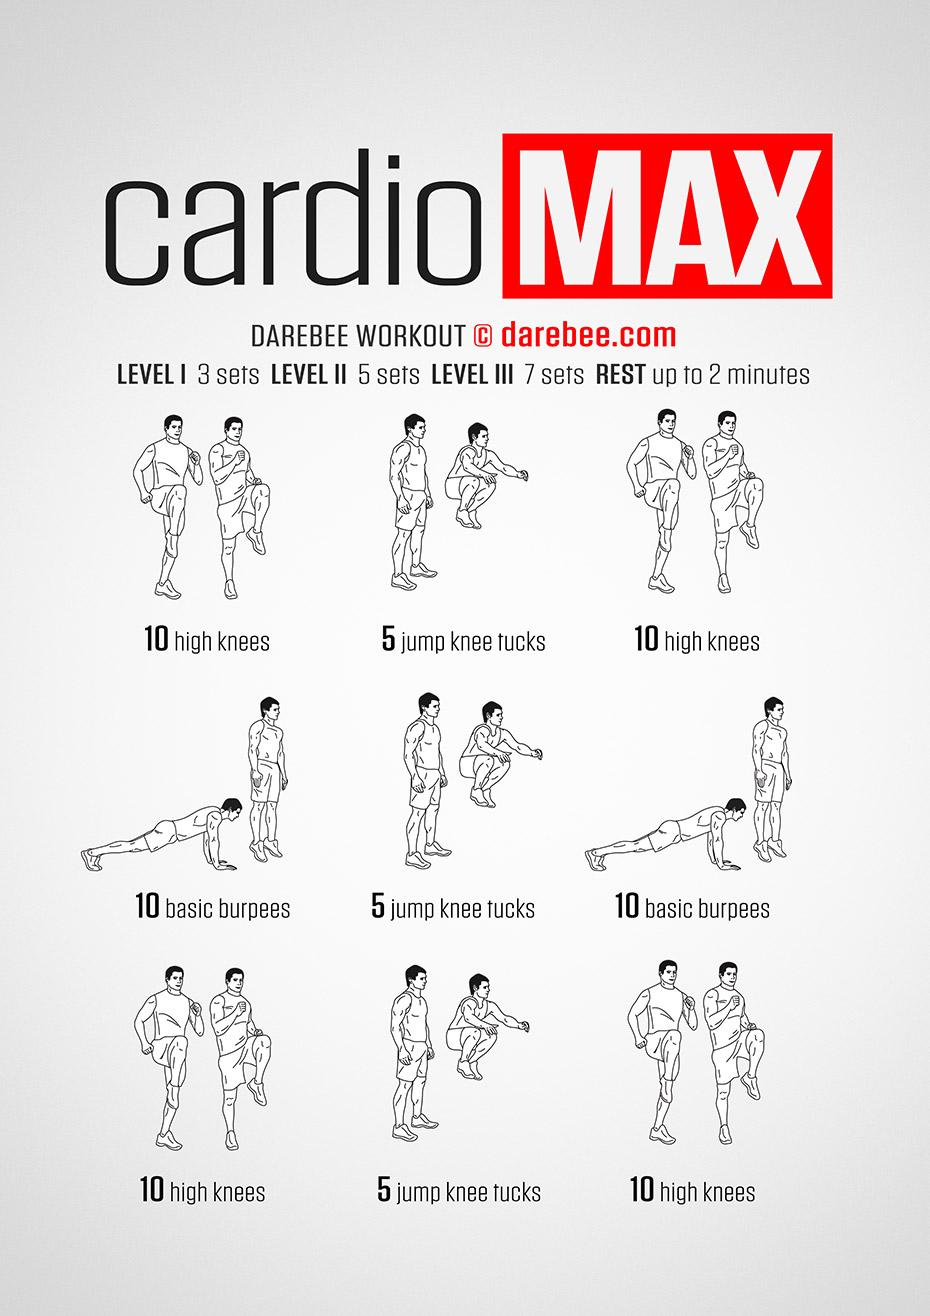 Cardio Max Workout